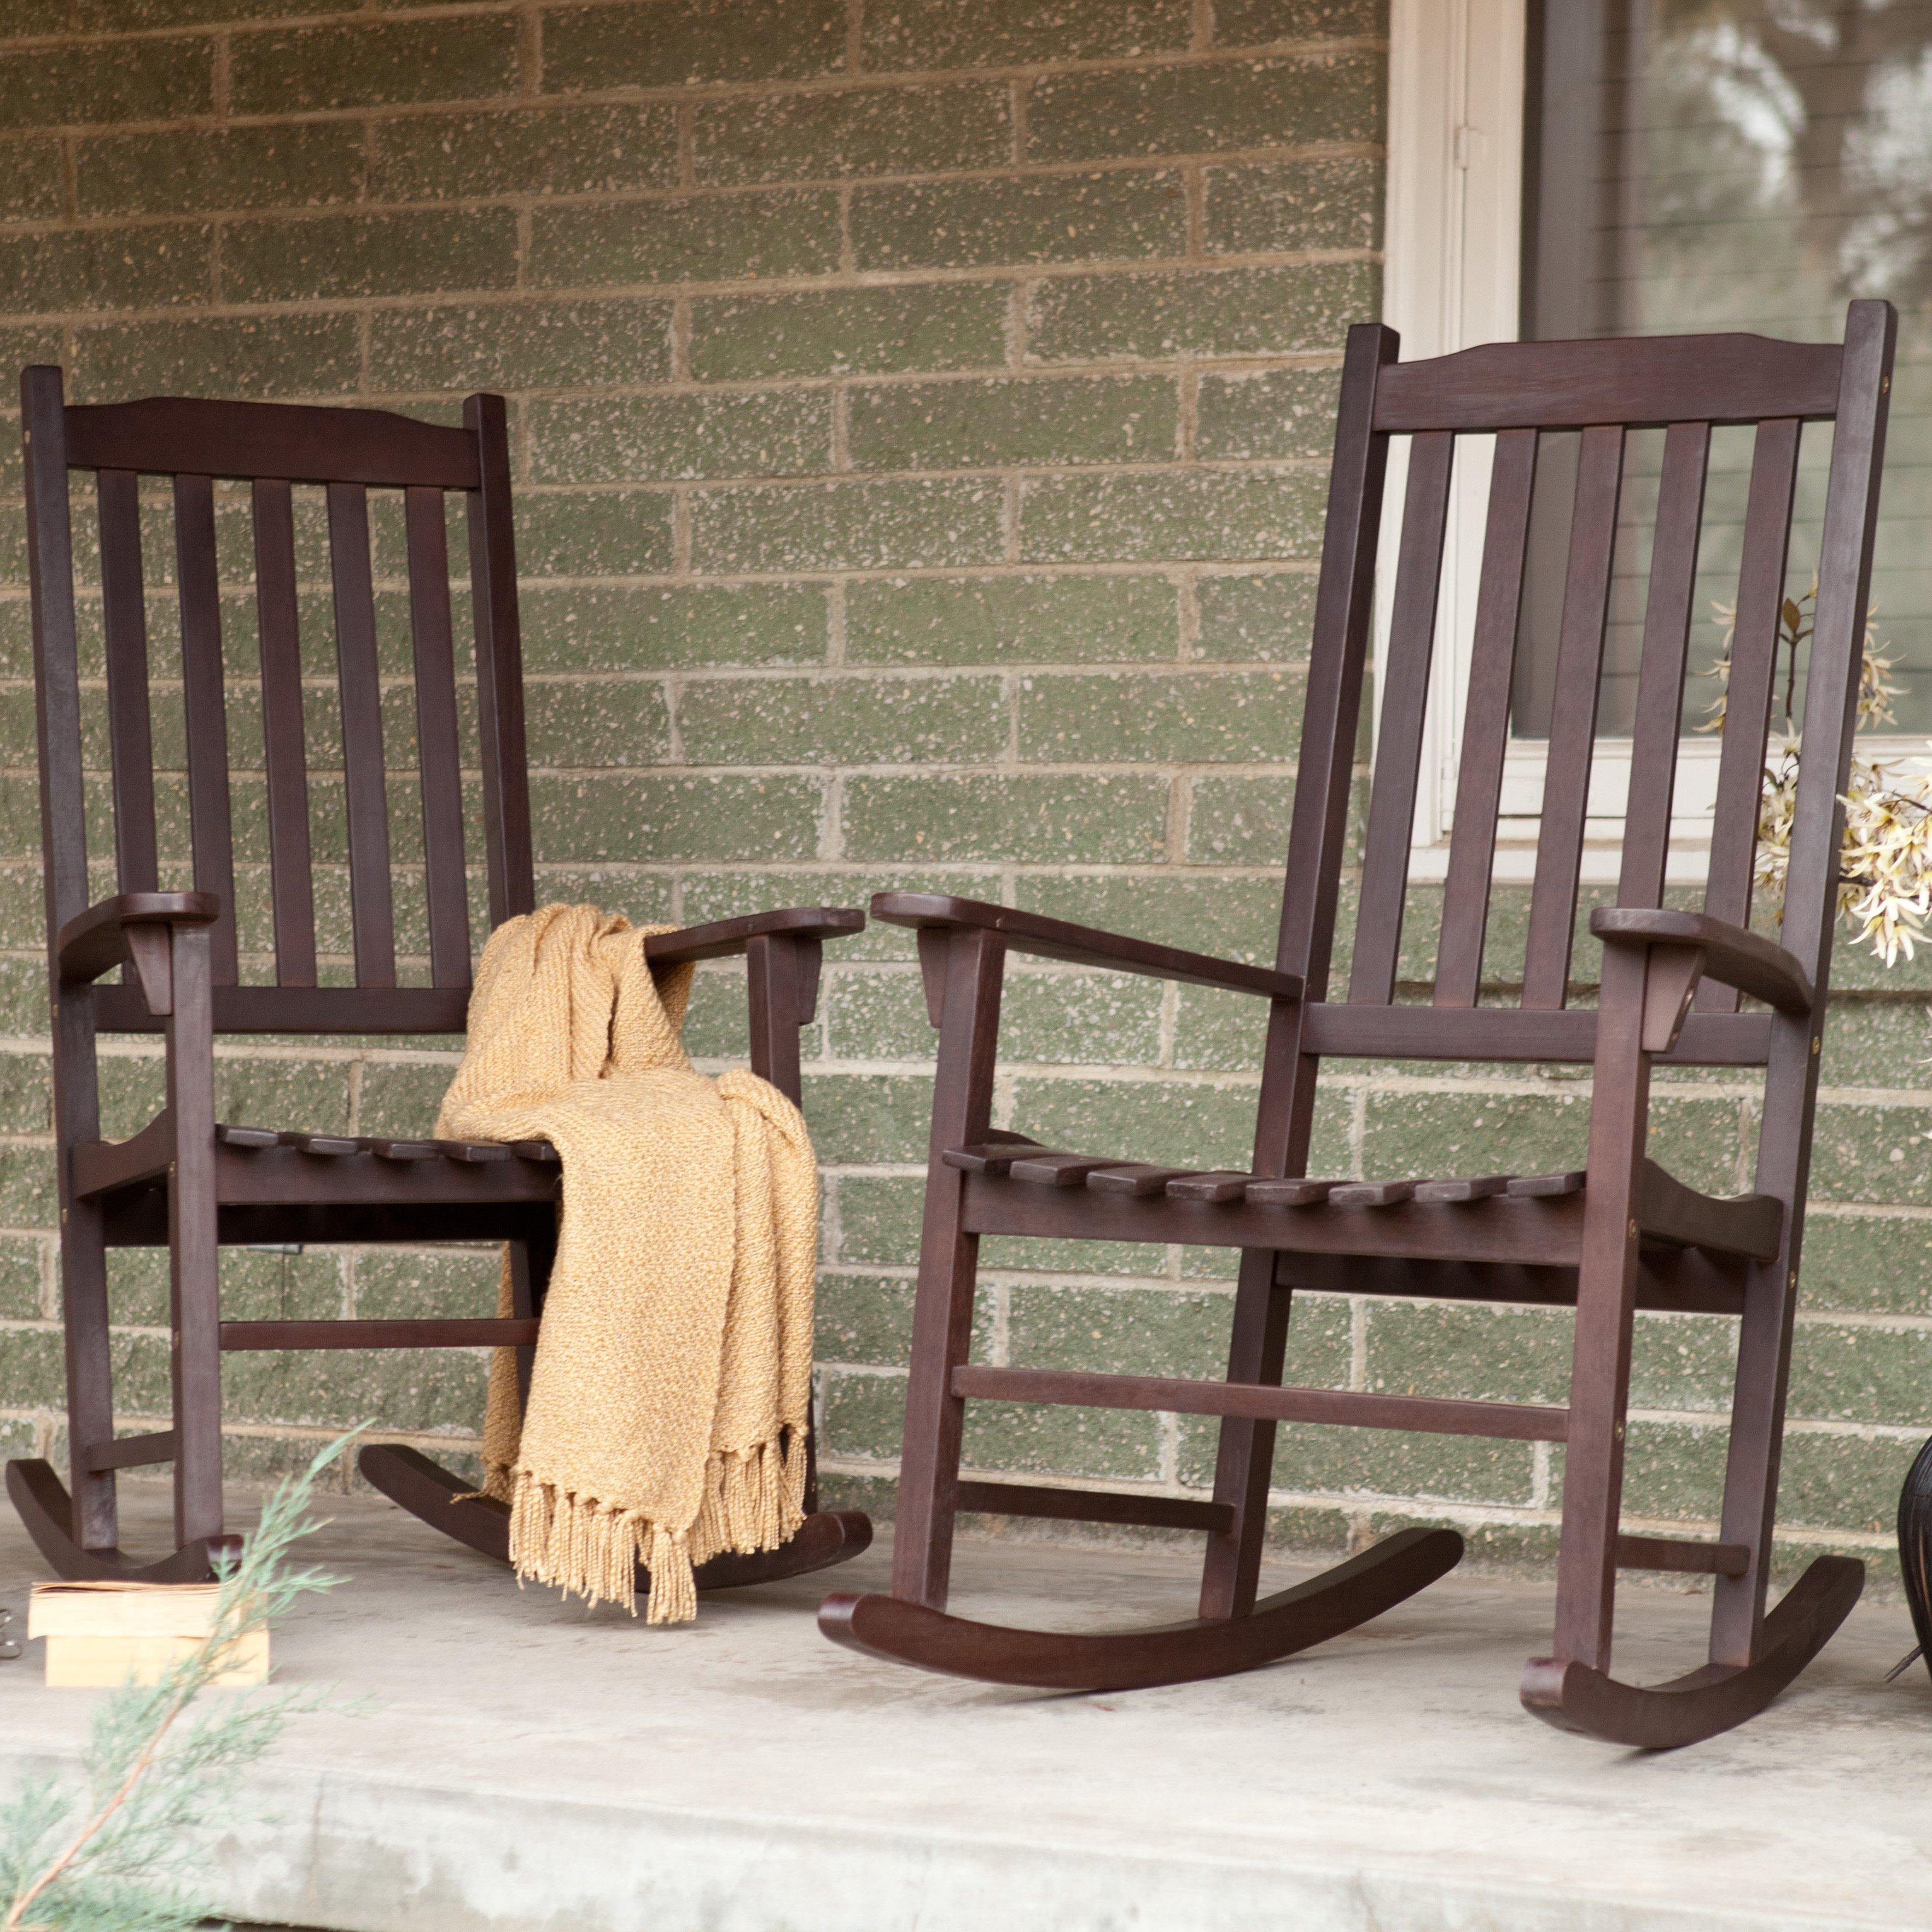 outdoor rocking chair coral coast indoor/outdoor mission slat rocking chair - natural | hayneedle XKWIRJA